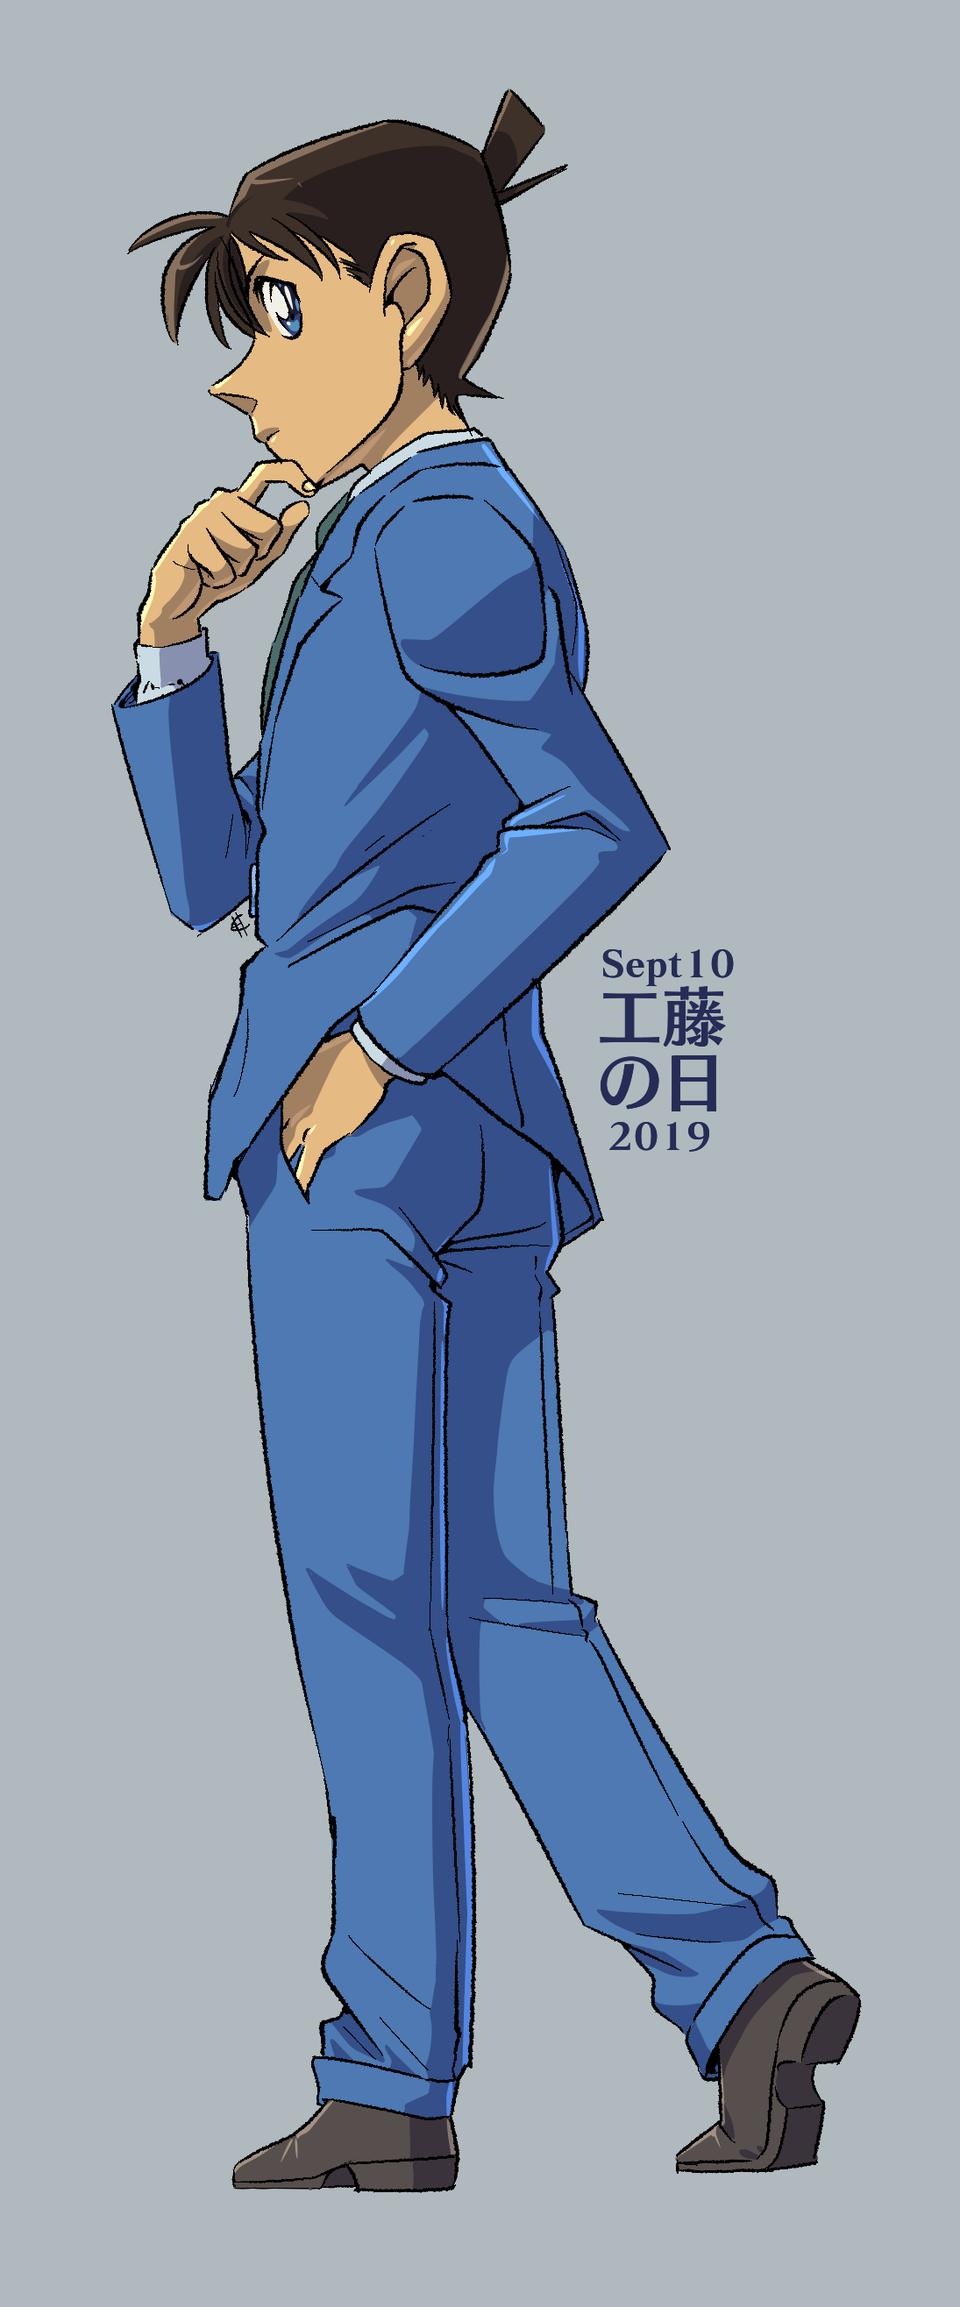 kudou day Illust of doublexxcross JimmyKudo medibangpaint 工藤の日 DetectiveConan